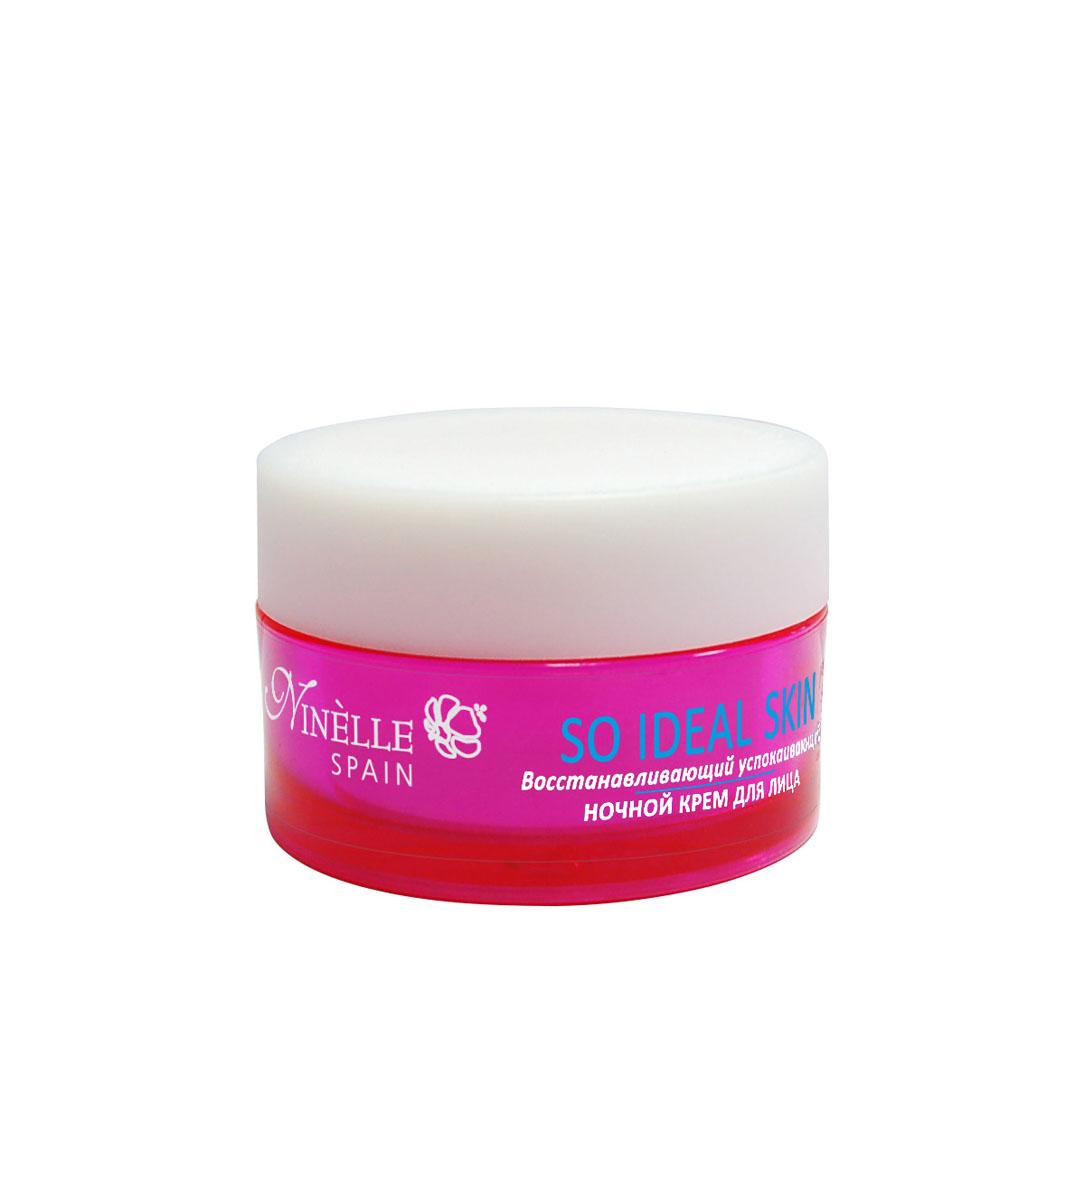 Ninelle So Ideal Skin Восстанавливающий успокаивающий ночной крем для лица, 50 мл